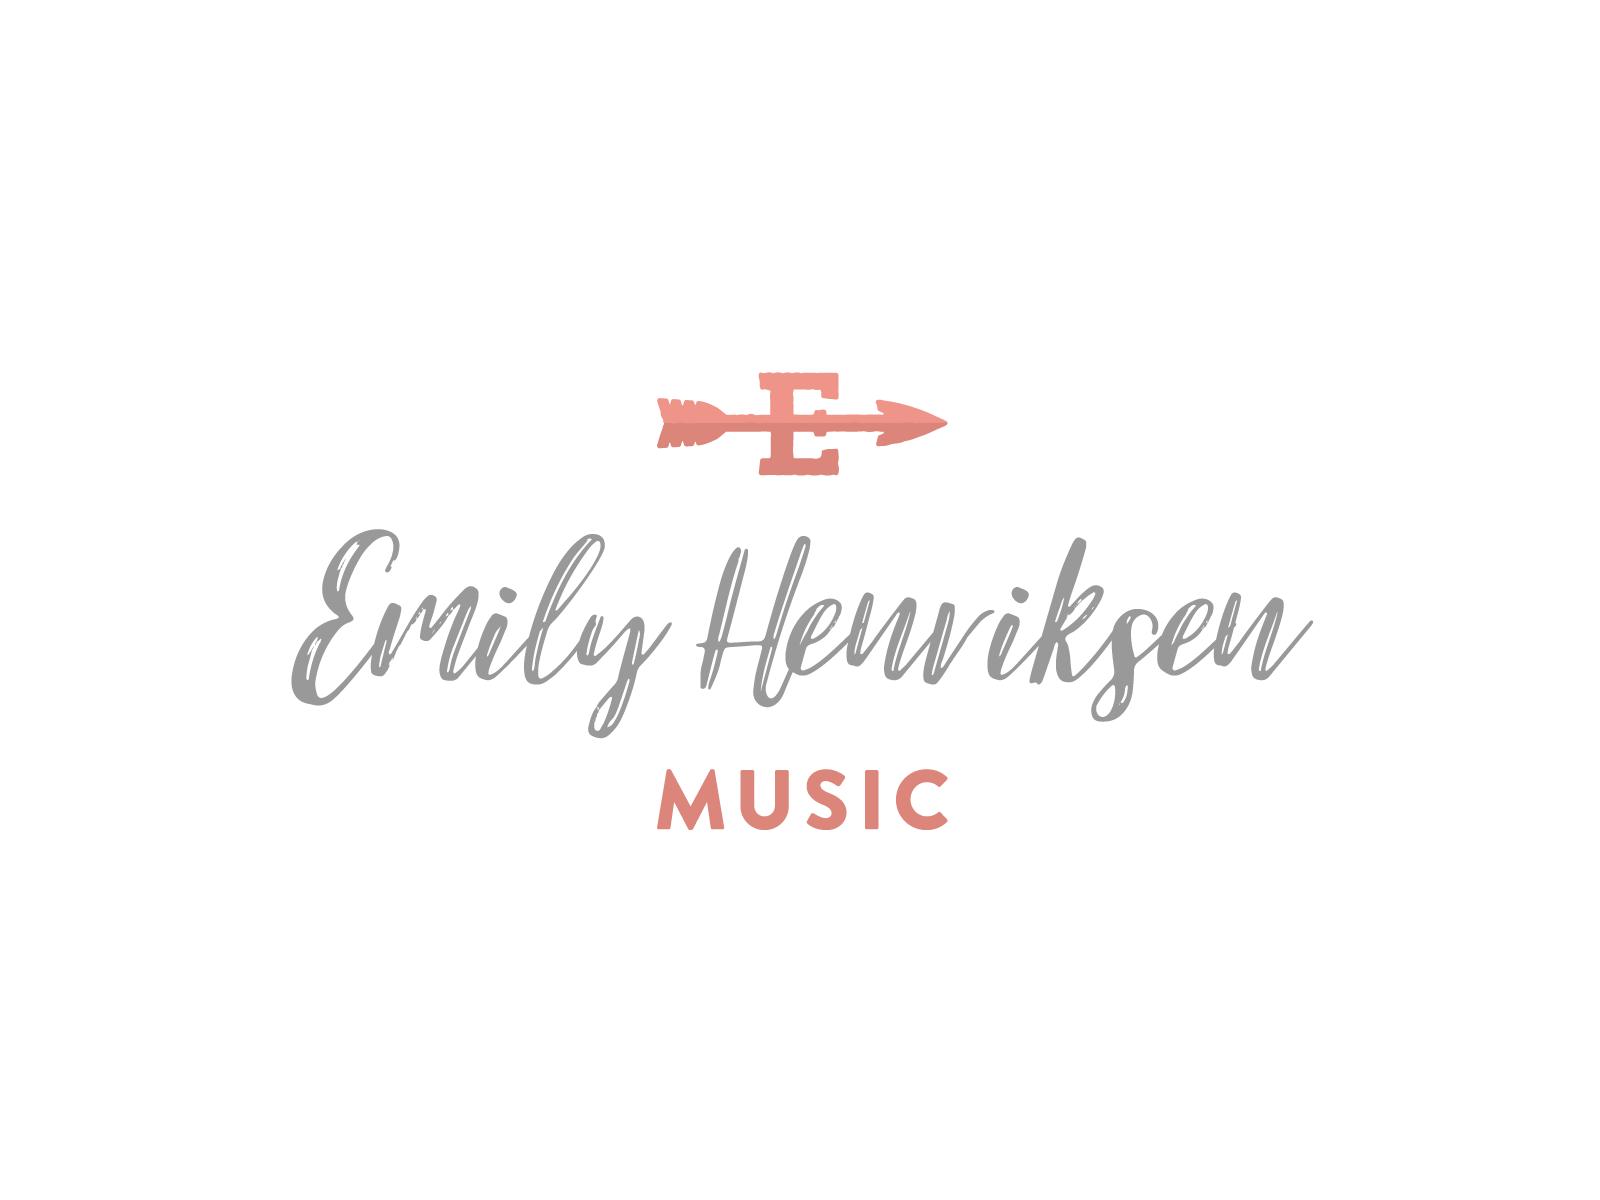 𝐌𝐚𝐭𝐭 𝐁𝐫𝐨𝐰𝐧 / Projects / Emily Henriksen Music | Dribbble